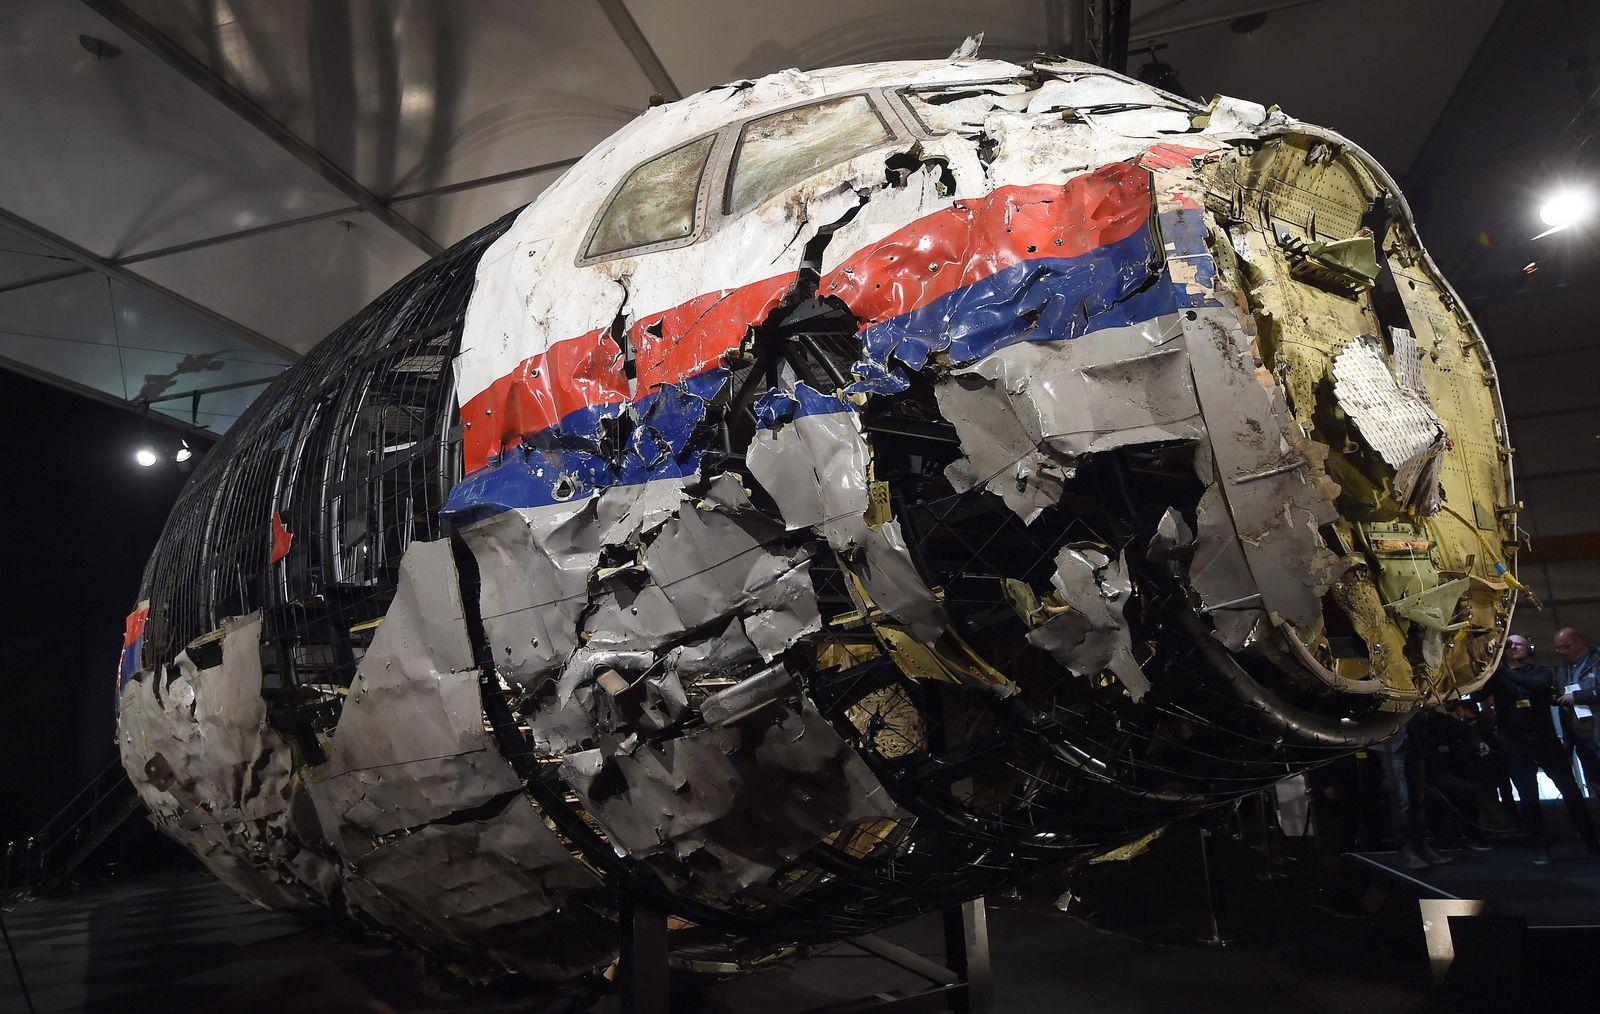 FILES-NETHERLANDS-UKRAINE-RUSSIA-MH17-CRASH-TRIAL